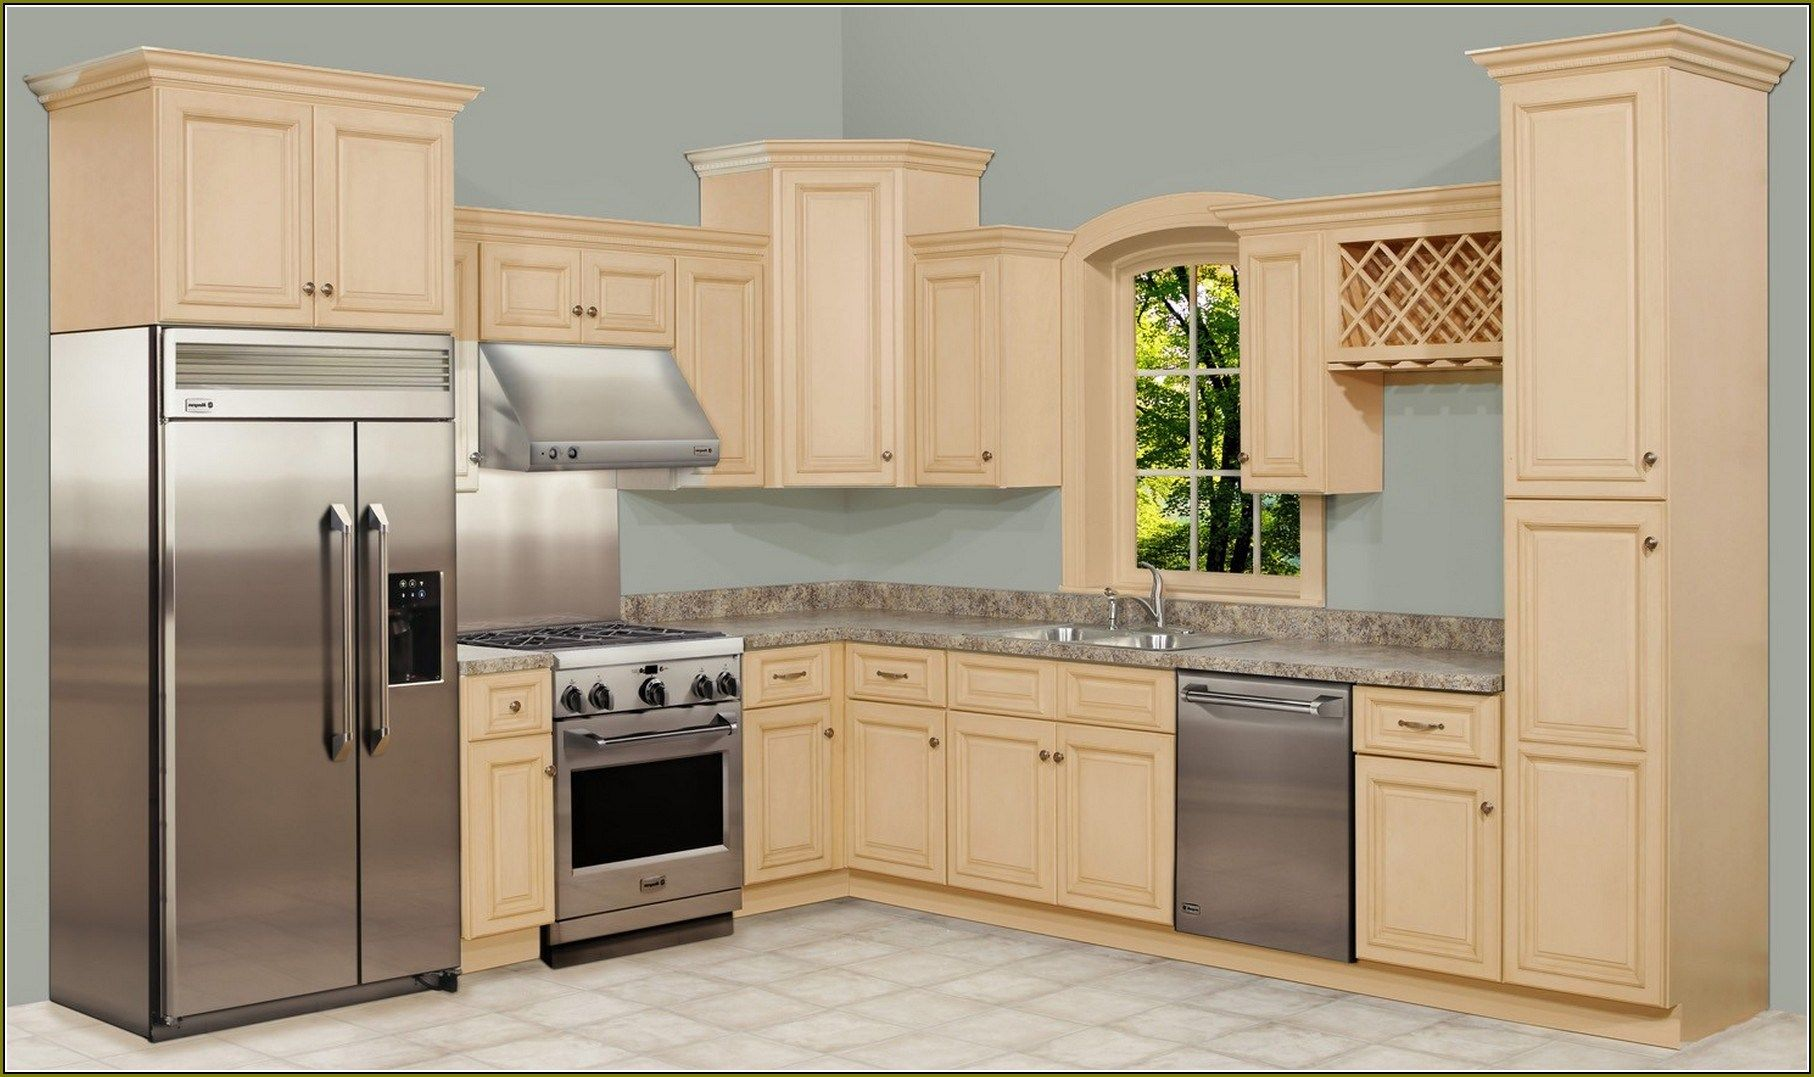 More Click Kitchen Cabinets Door Ideas Styles Kitchen Cabinet